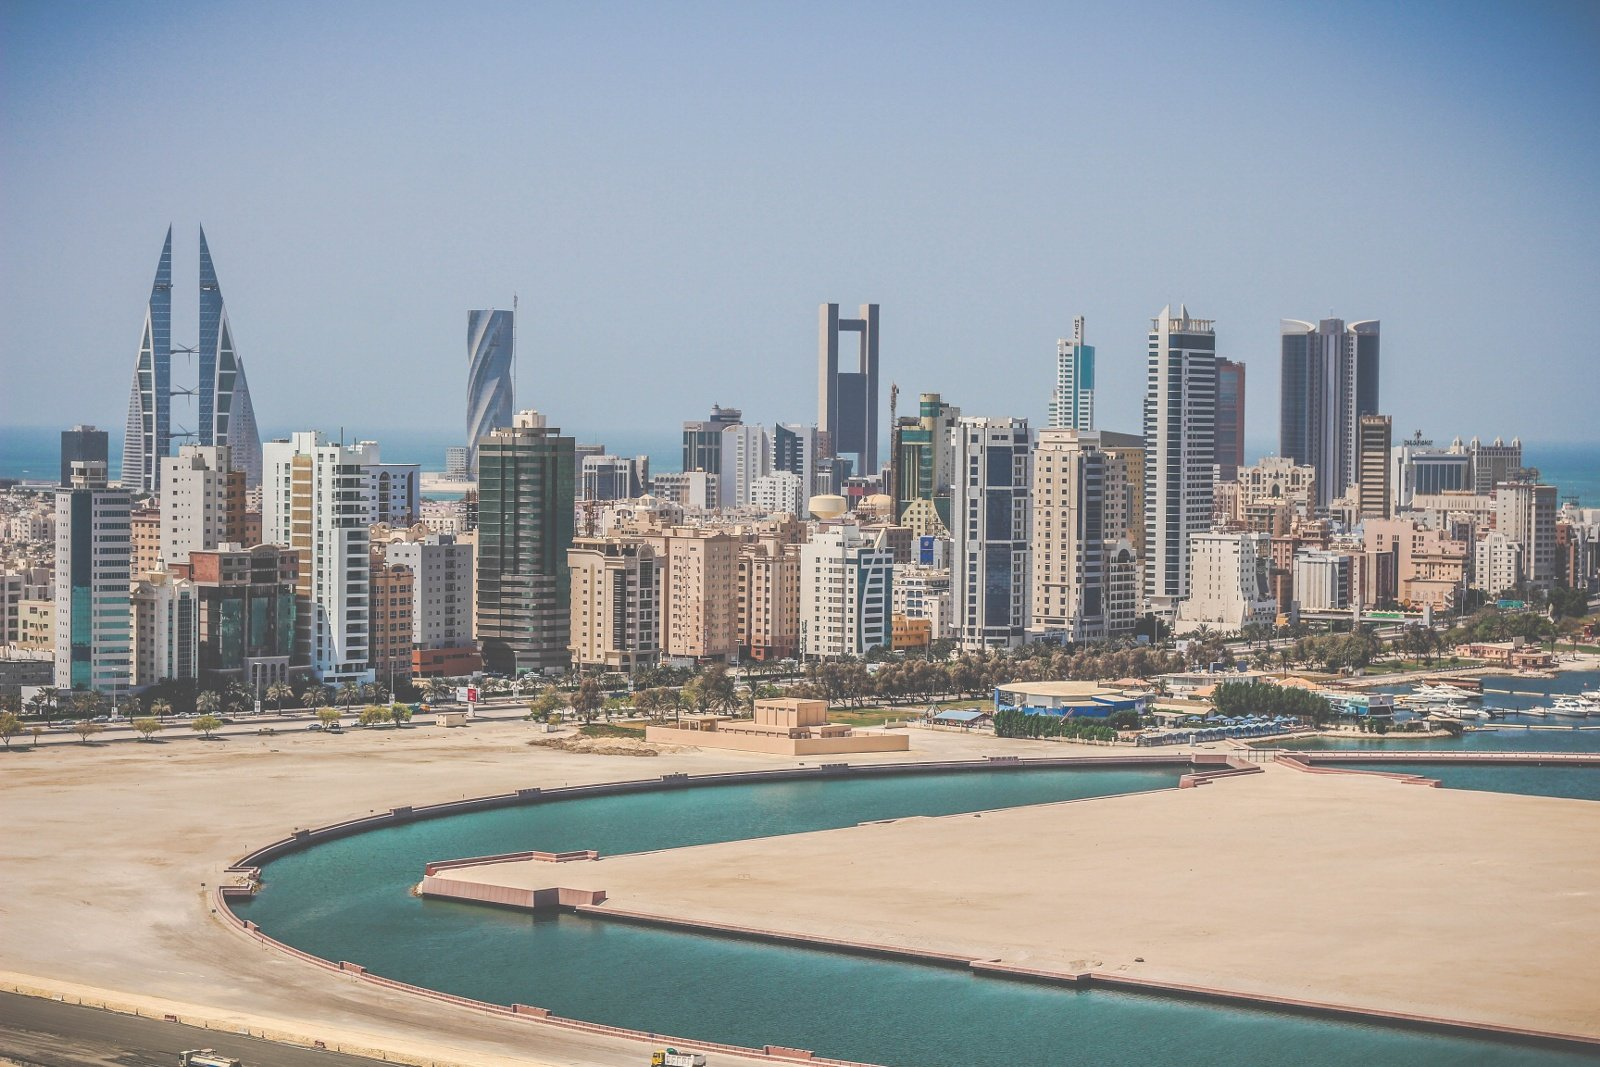 Huawei to build Tier III data center for Bahrain's Batelco - DCD